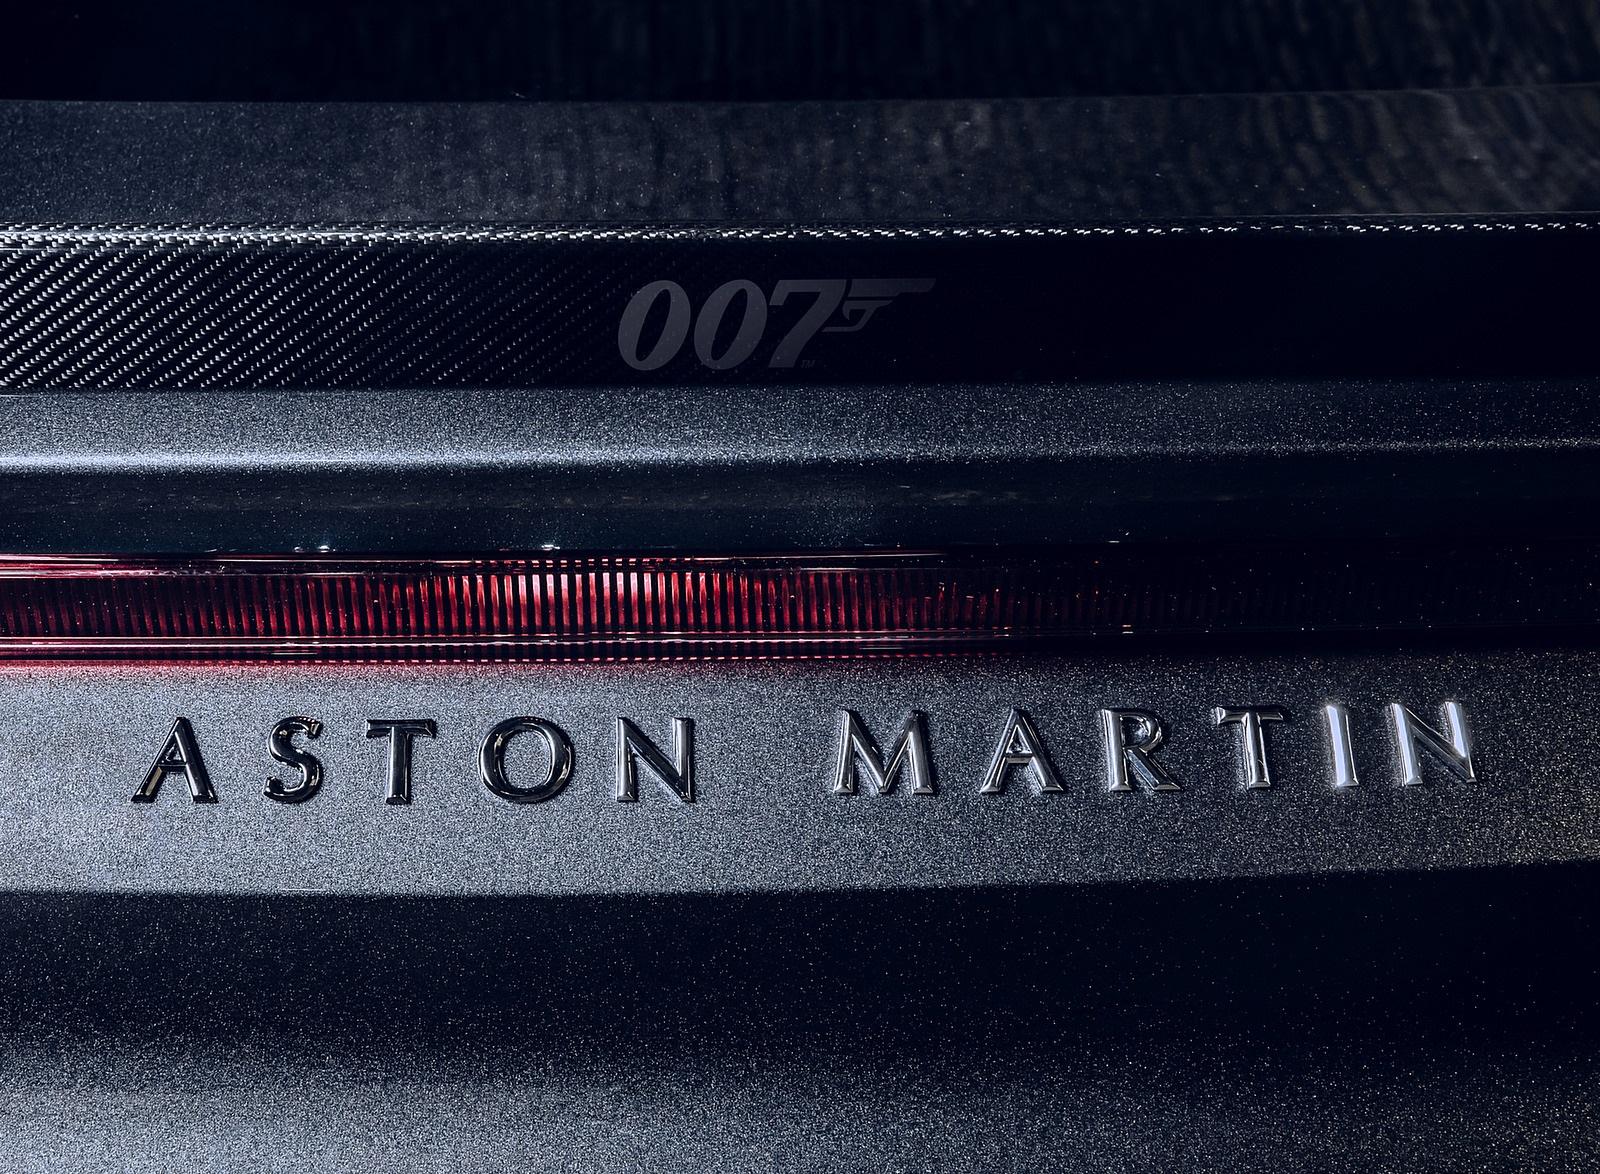 2021 Aston Martin DBS Superleggera 007 Edition Detail Wallpapers (7)